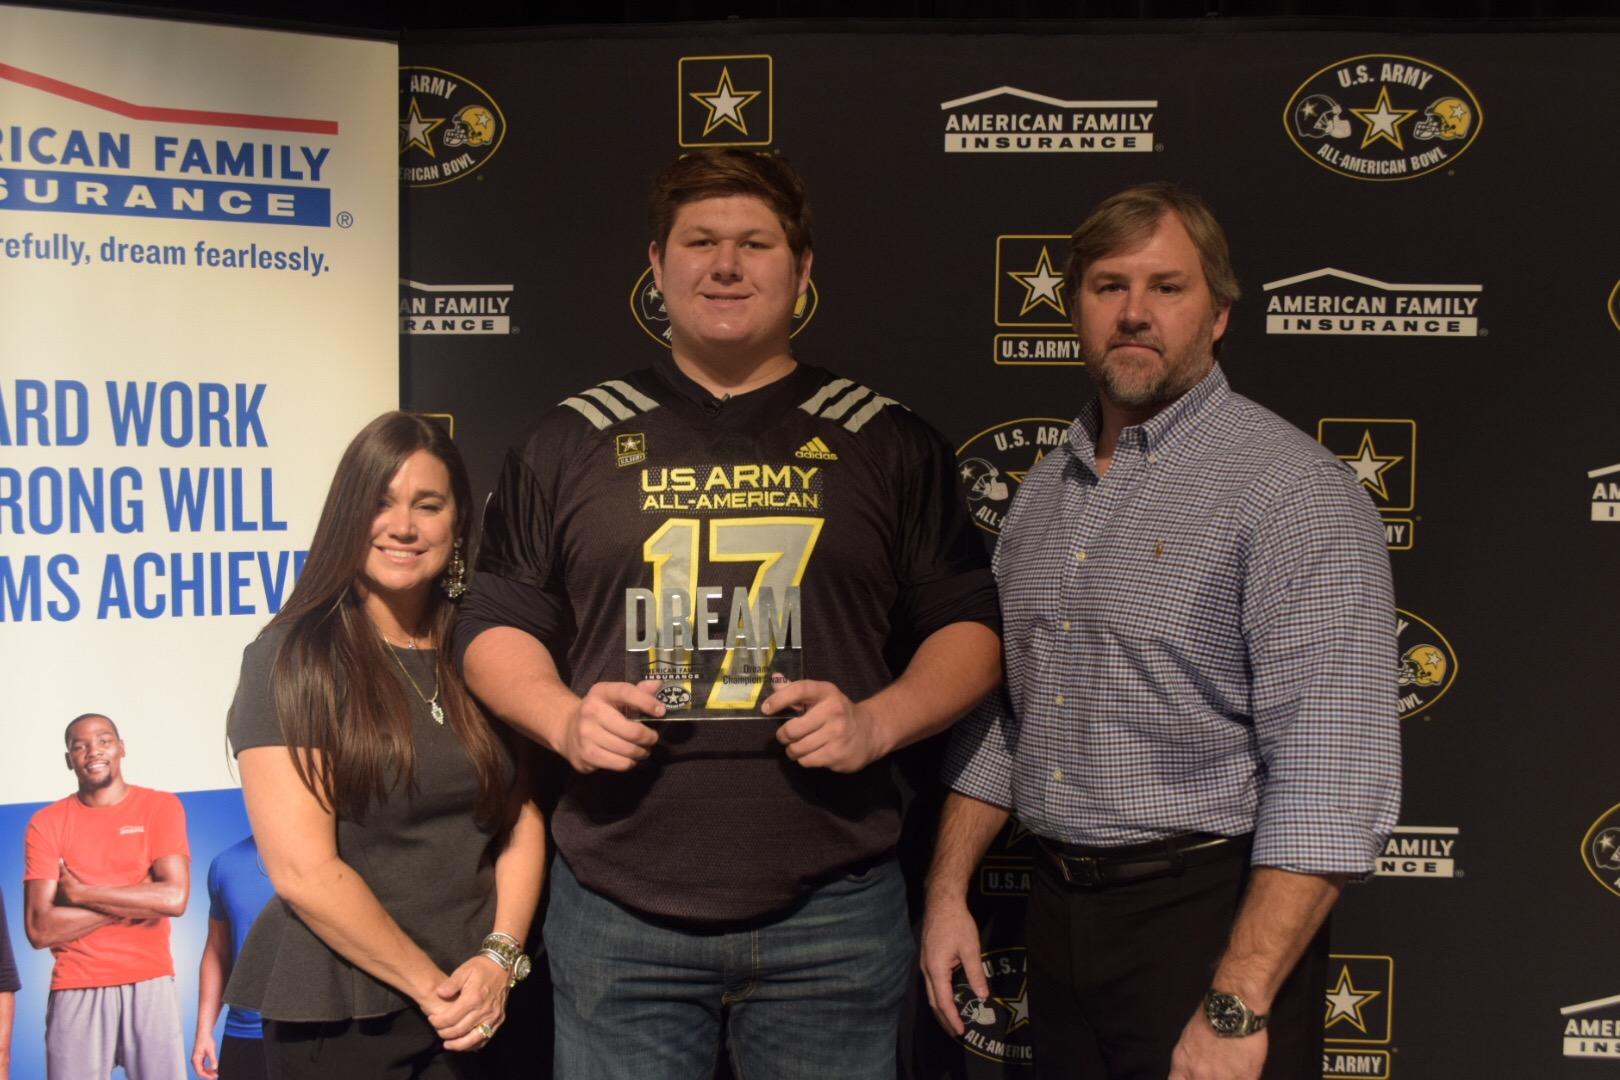 Creed Humphrey presented his parents, Melisa and Chad Humphrey, with the Dream Champion Award. (Photo: AAG)